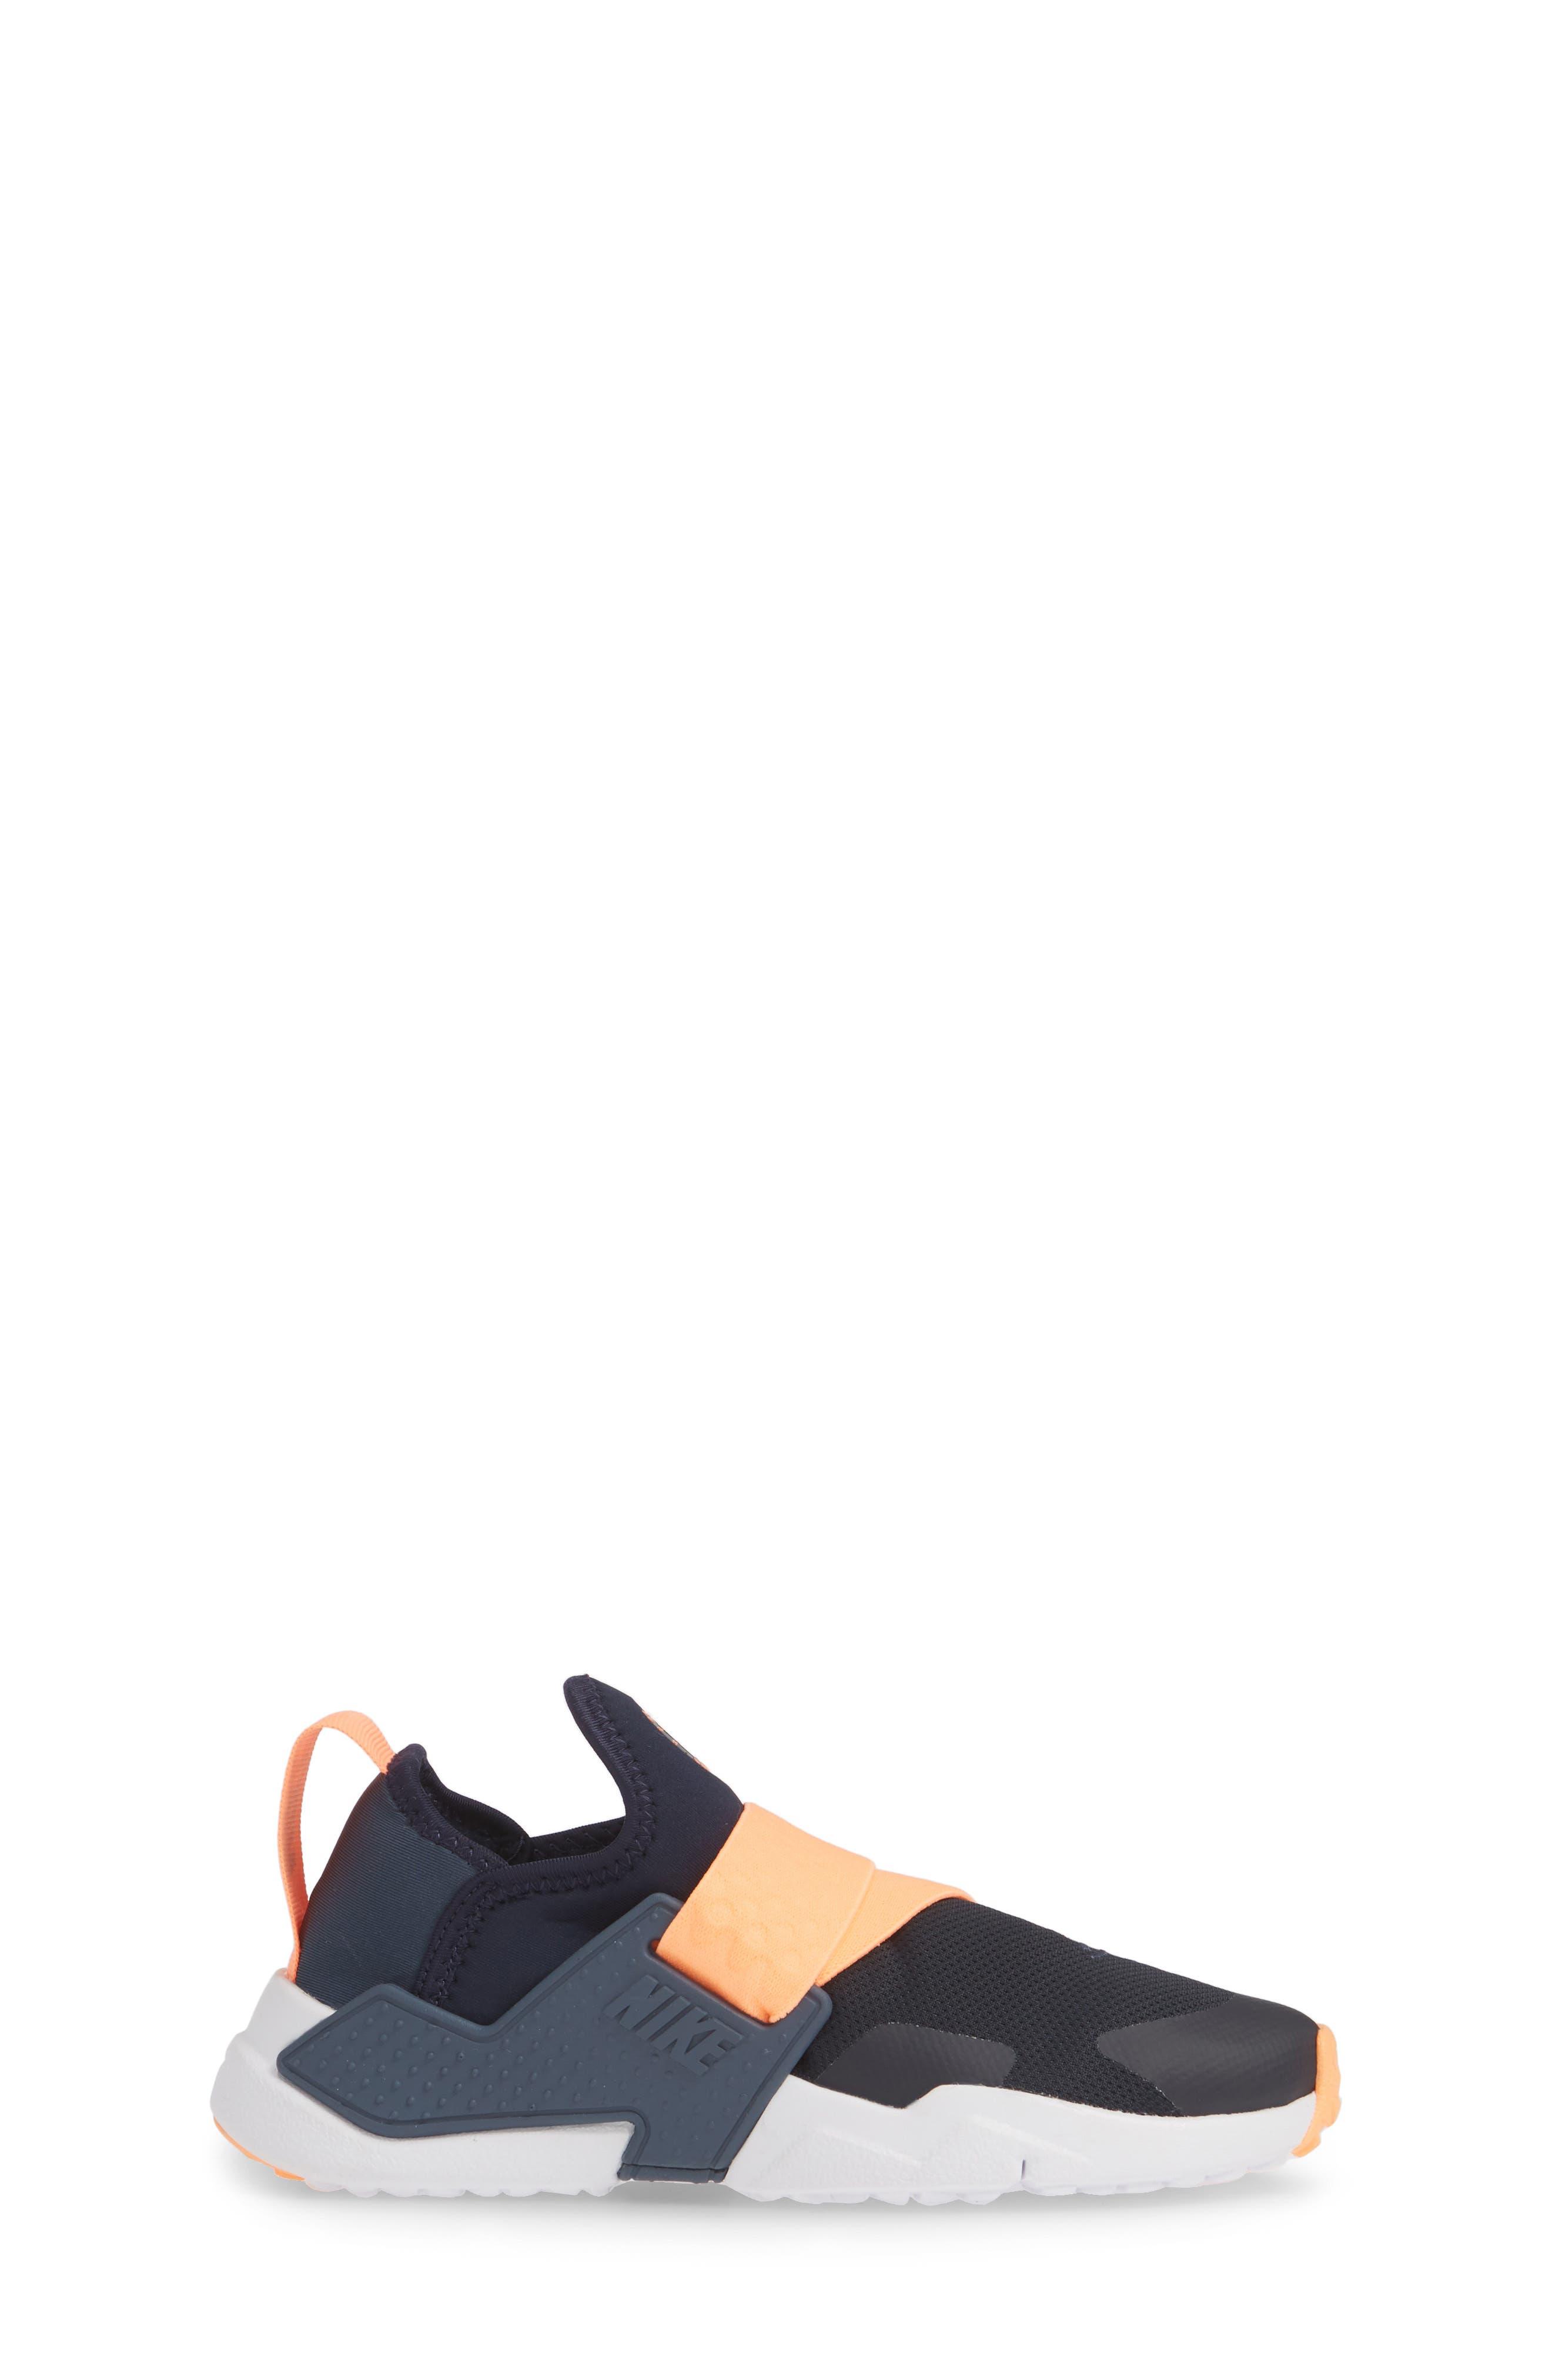 NIKE, Huarache Extreme Sneaker, Alternate thumbnail 3, color, OBSIDIAN/ POLARIZED BLUE-BLUE